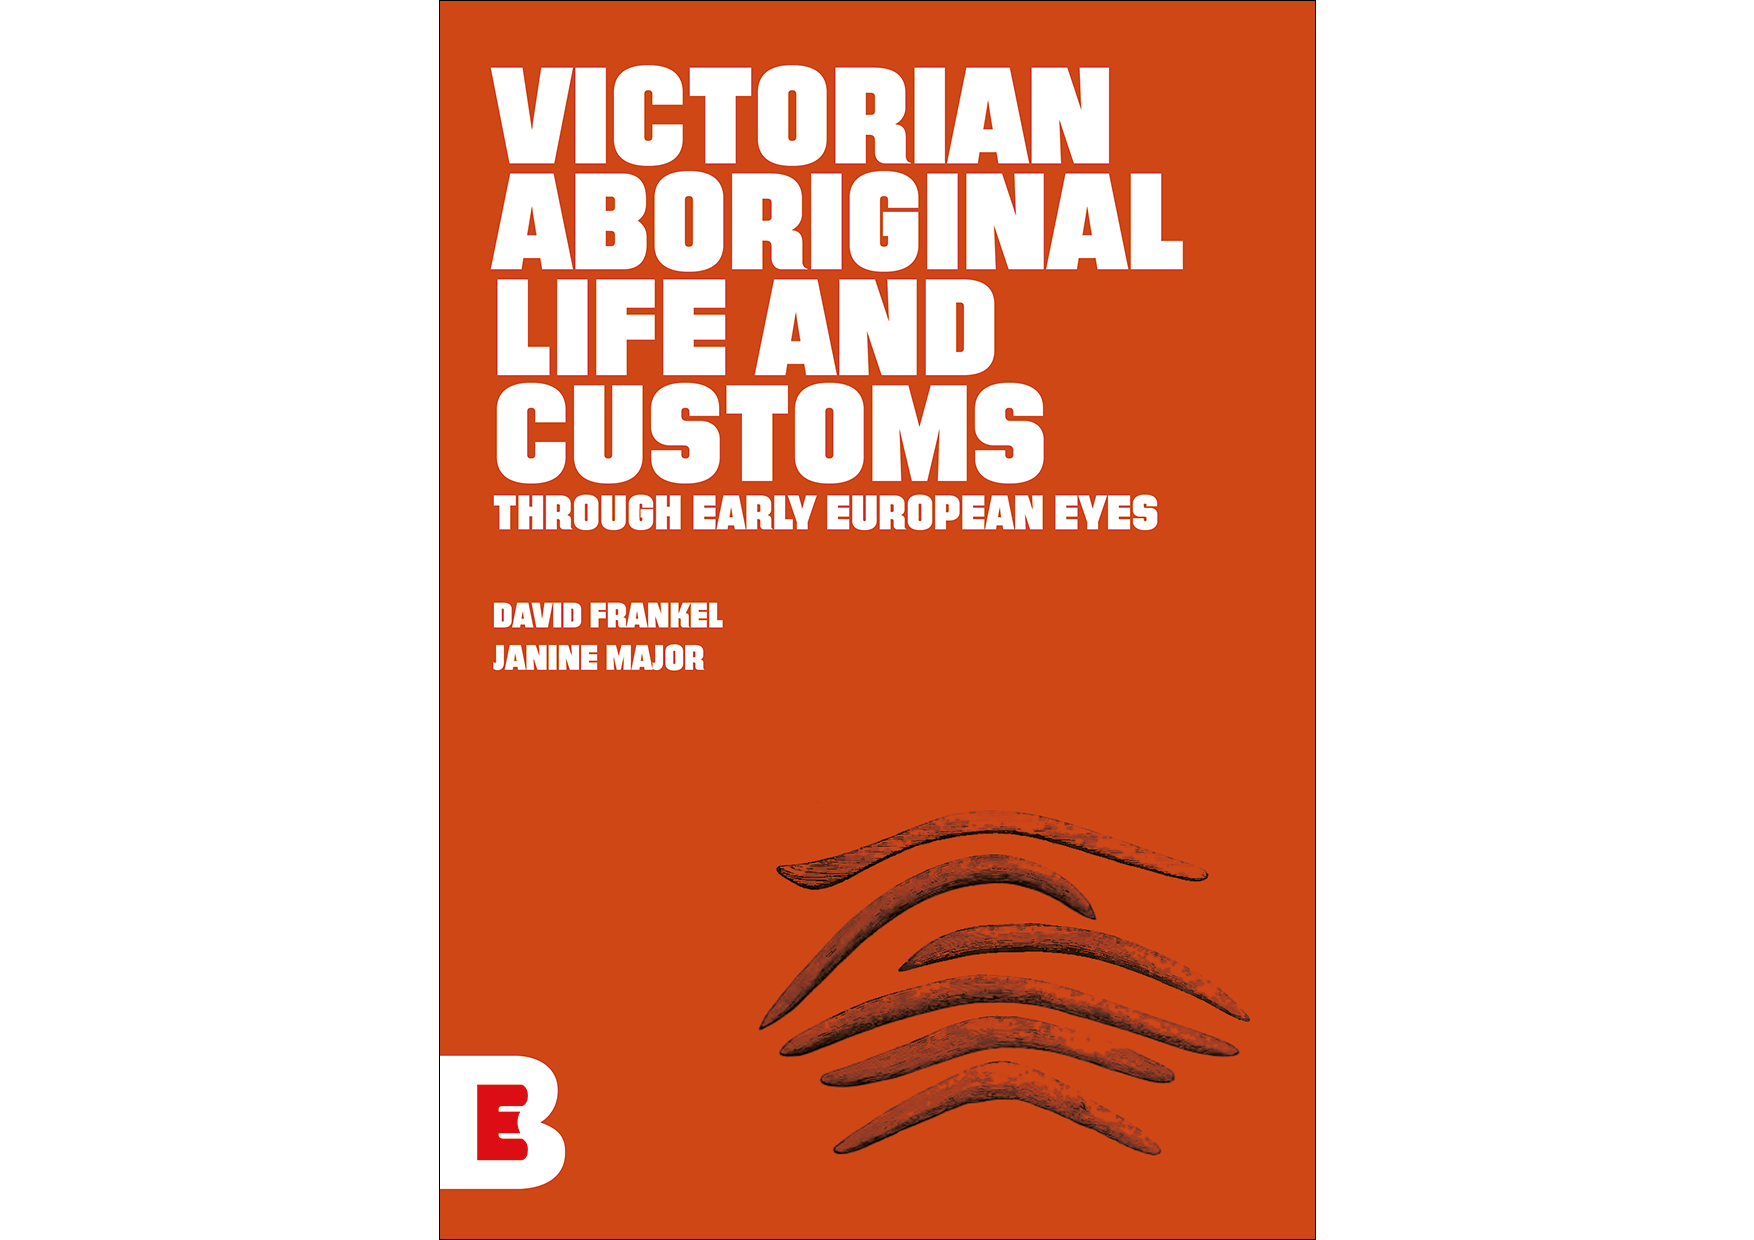 Victorian Aboriginal life and customs through early European eyes (2016, La Trobe eBureau)